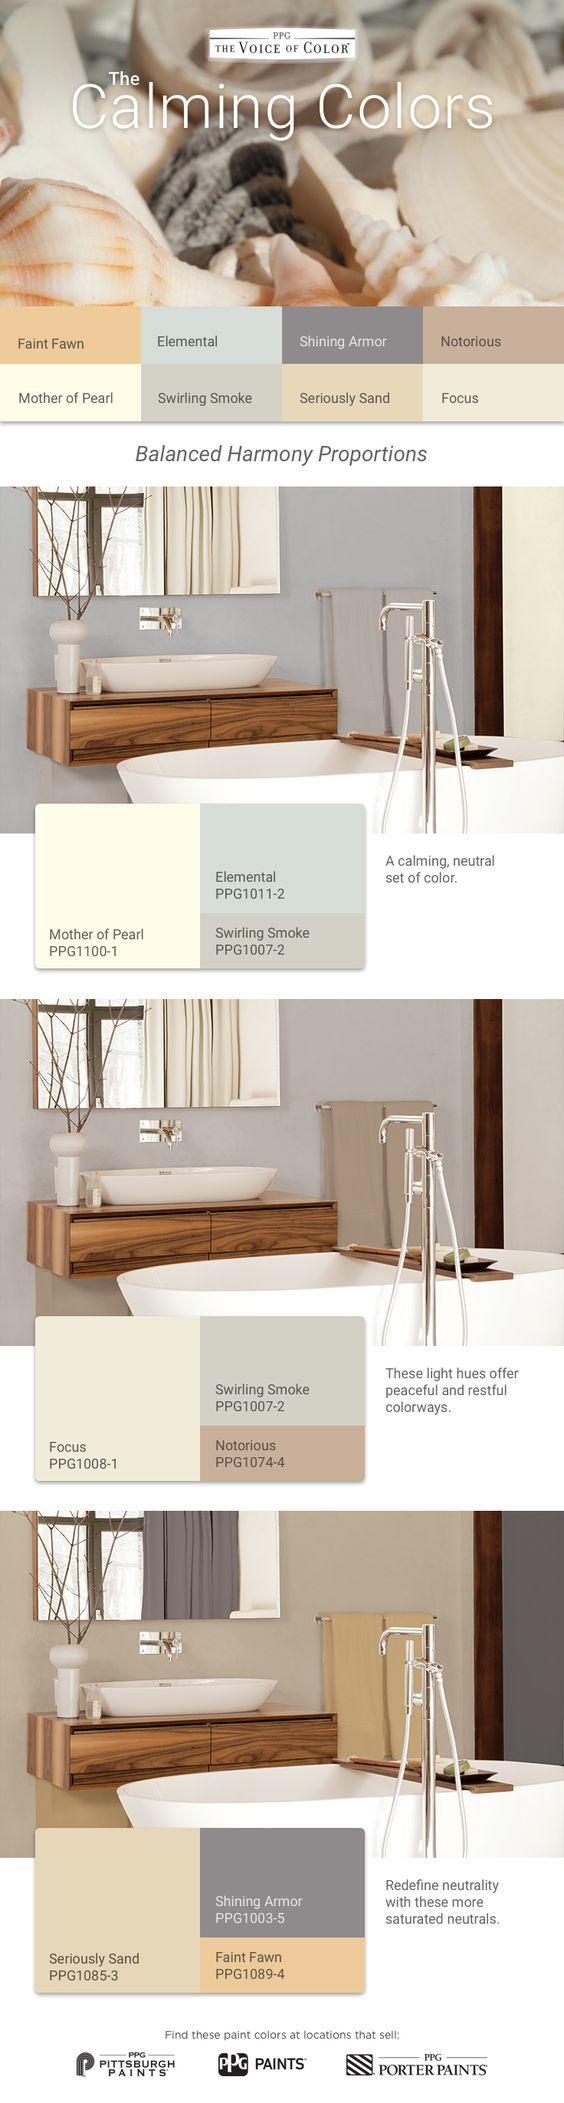 12 Best Cool Modern Design Style Color Palette Images On